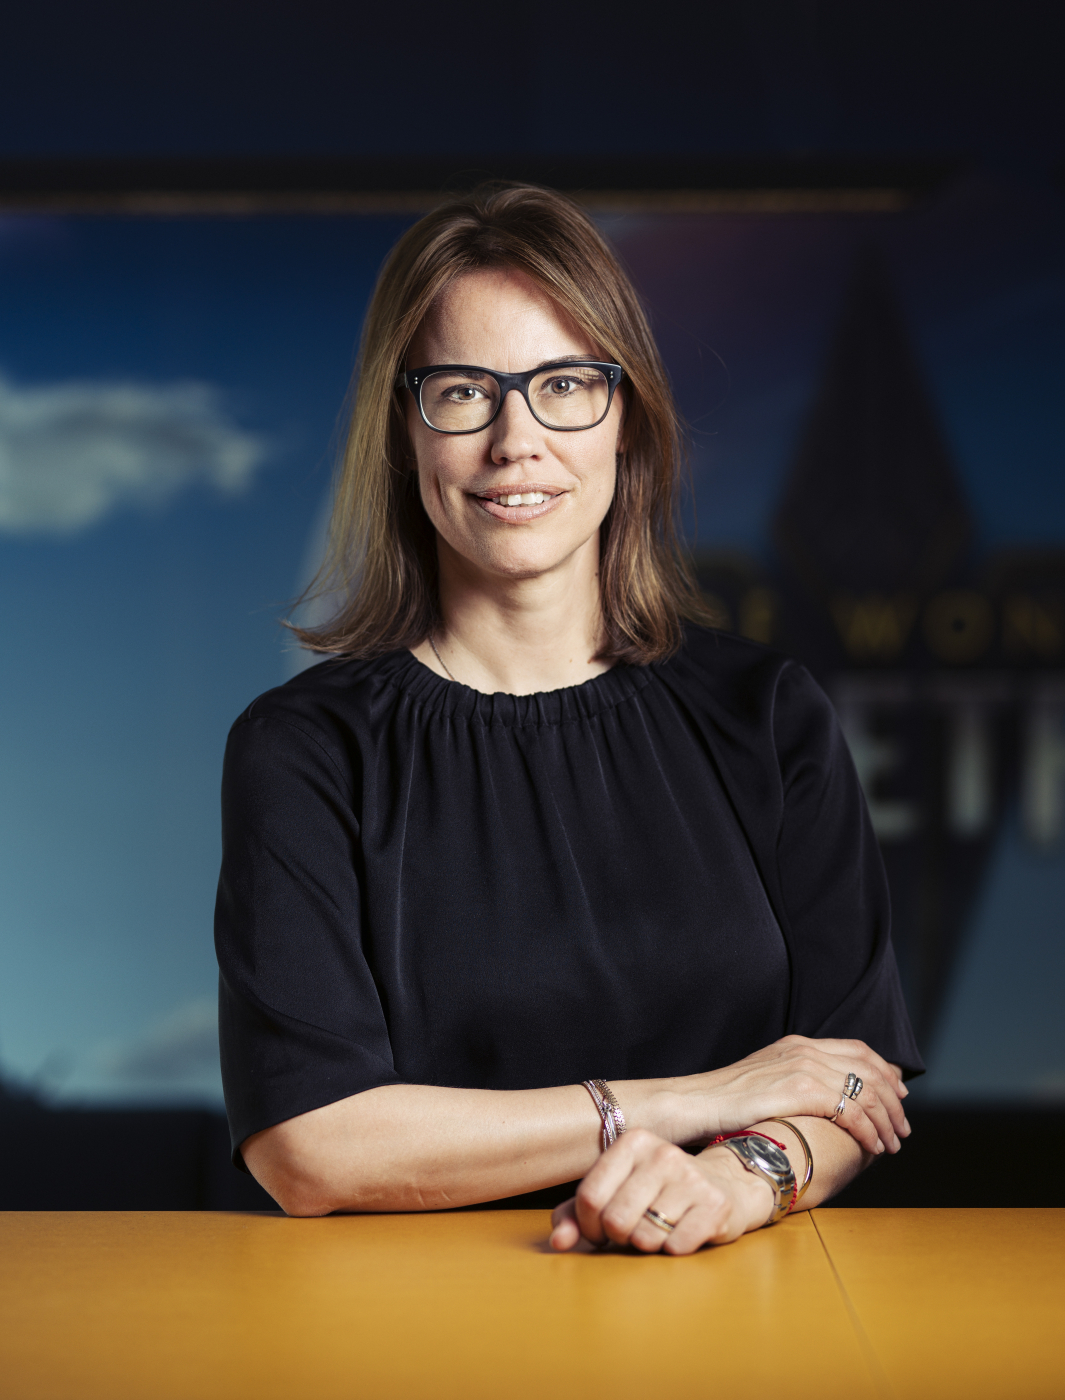 Ebba Ljungerud